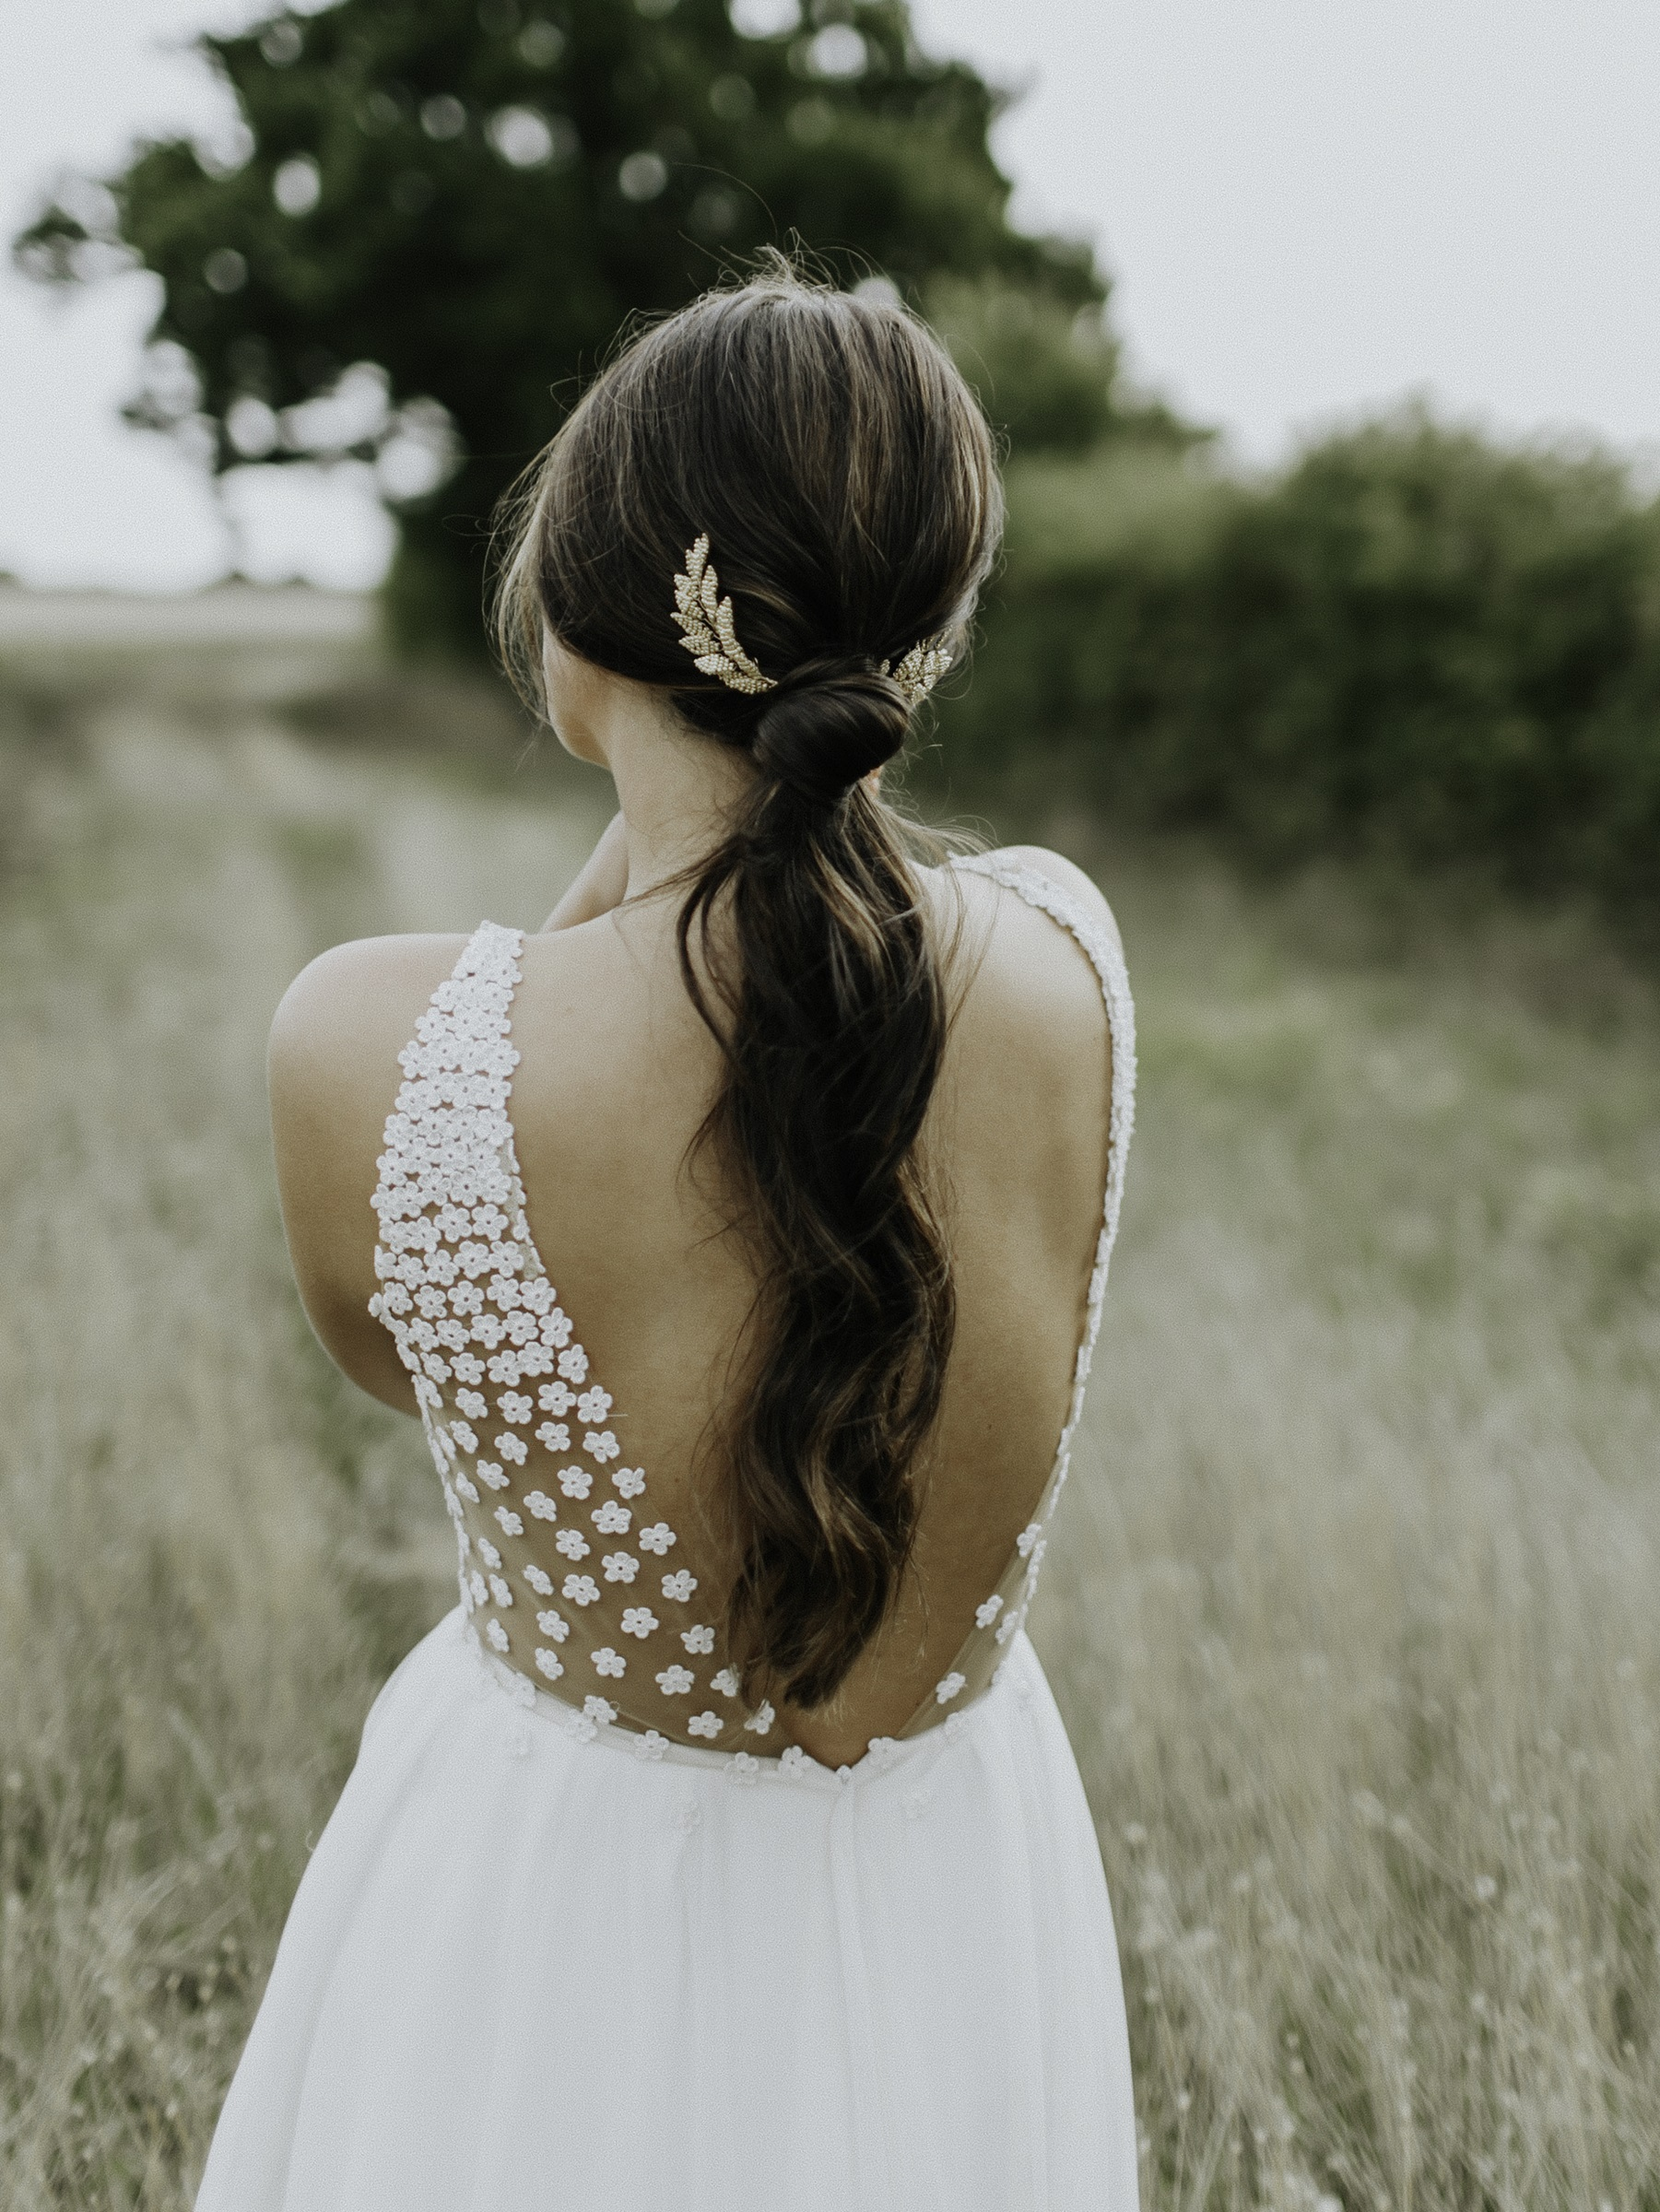 Eden b Delicate Natural Bridal Hair Accessories8.jpg